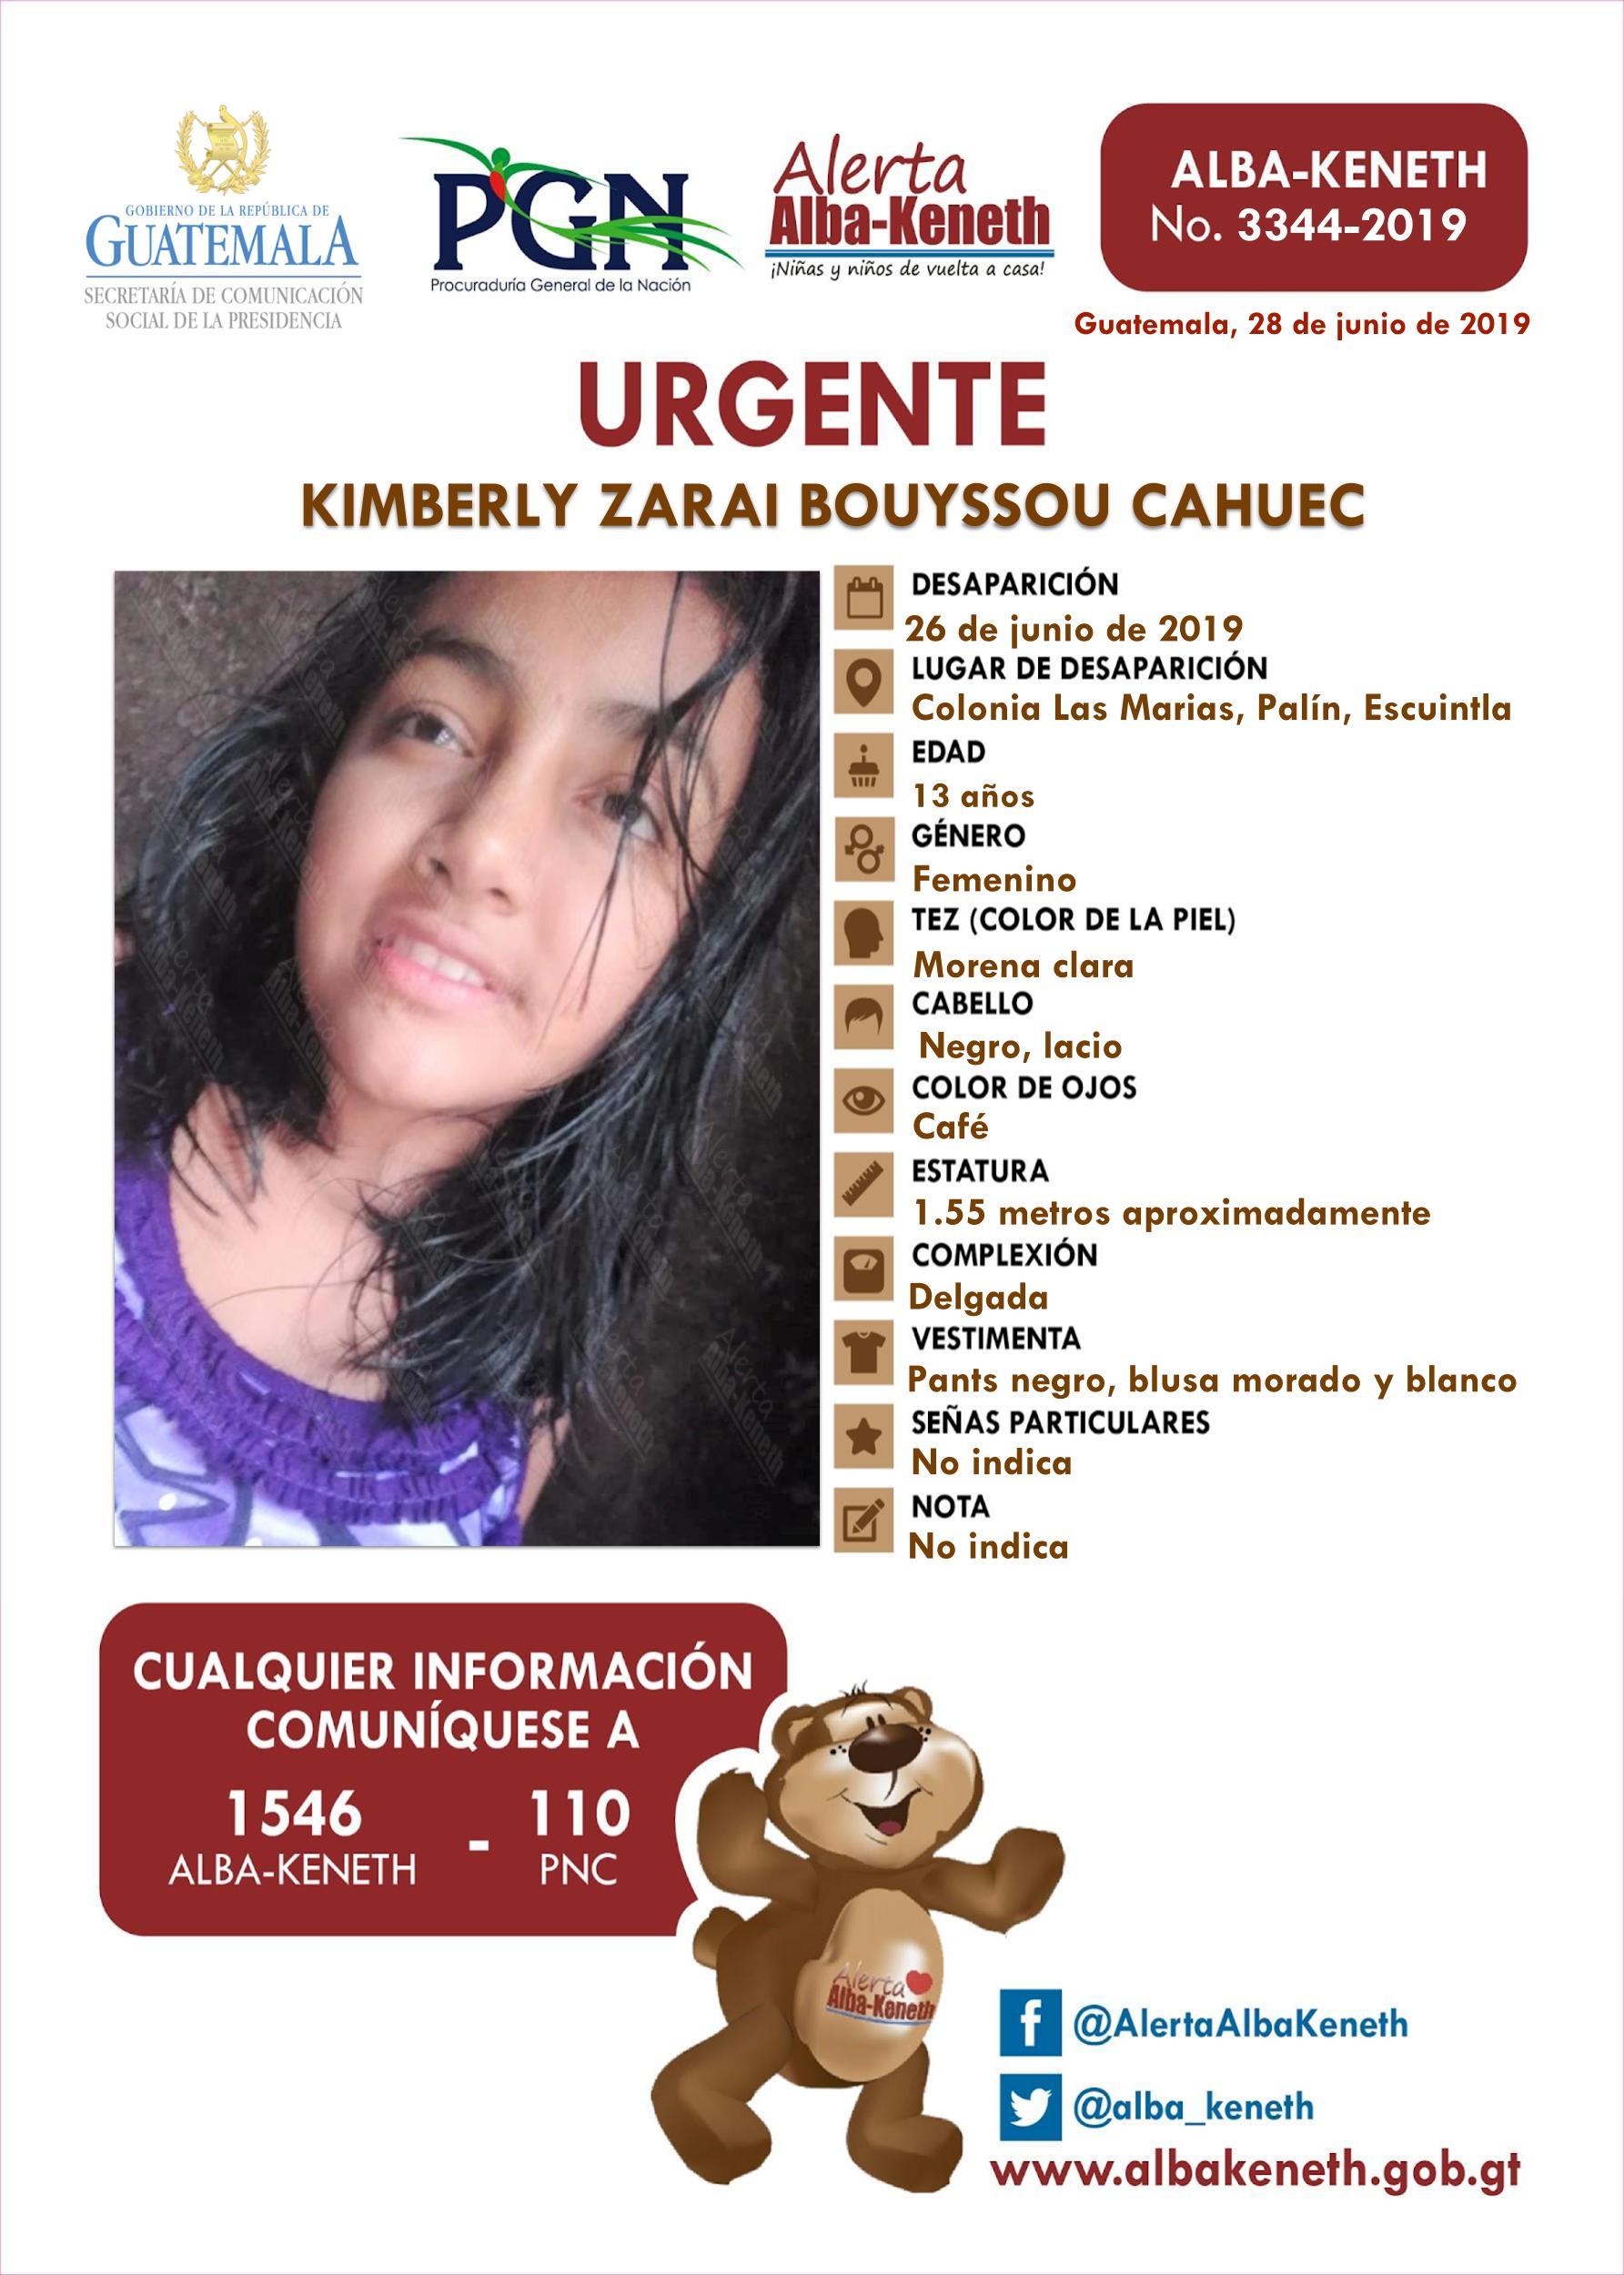 Kimberly Zarai Bouyssou Cahuec